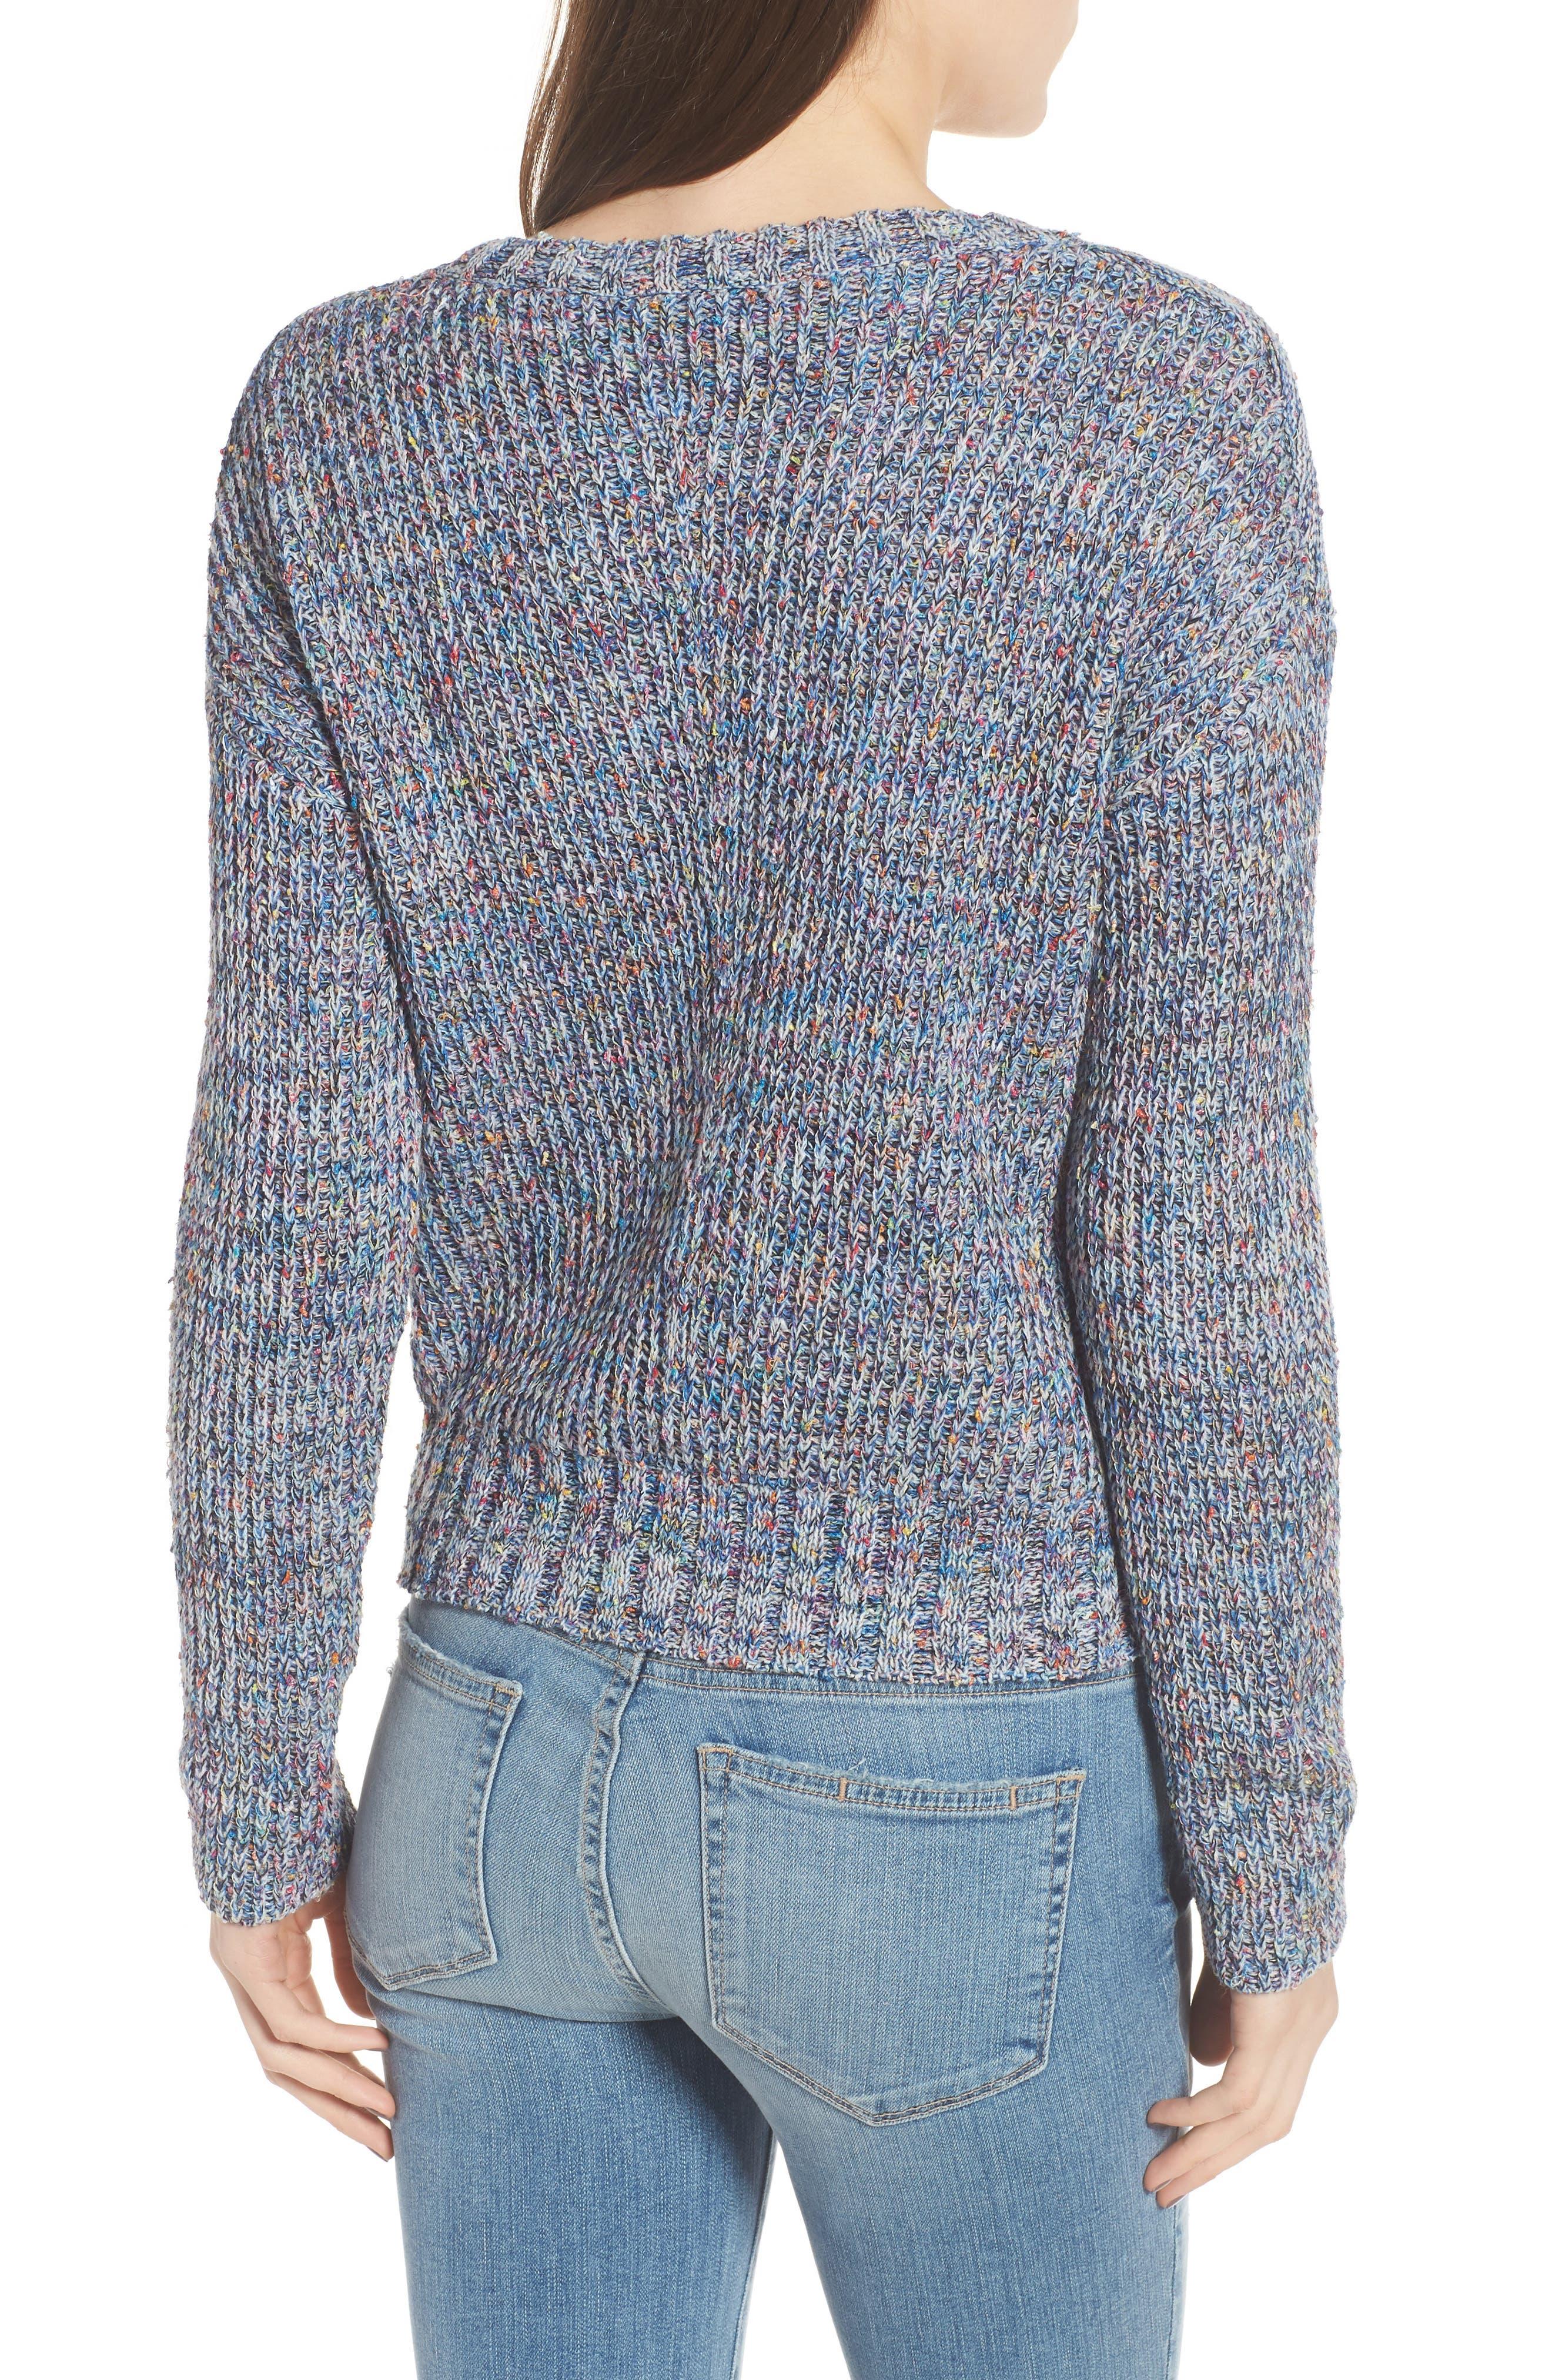 Elsa Sweater,                             Alternate thumbnail 2, color,                             SPECKLED BLUE